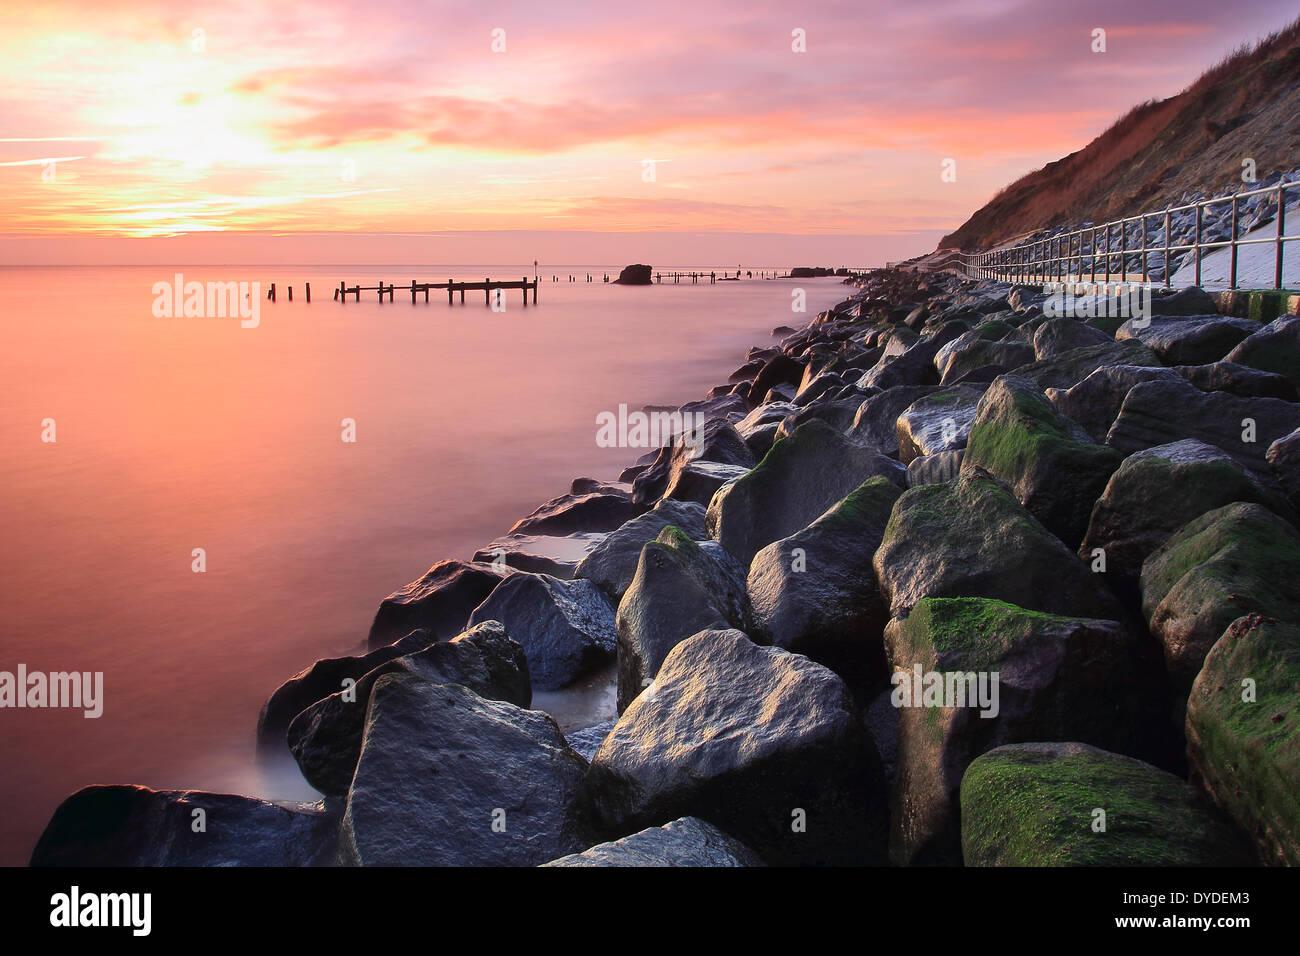 A view of Corton sea defences. - Stock Image